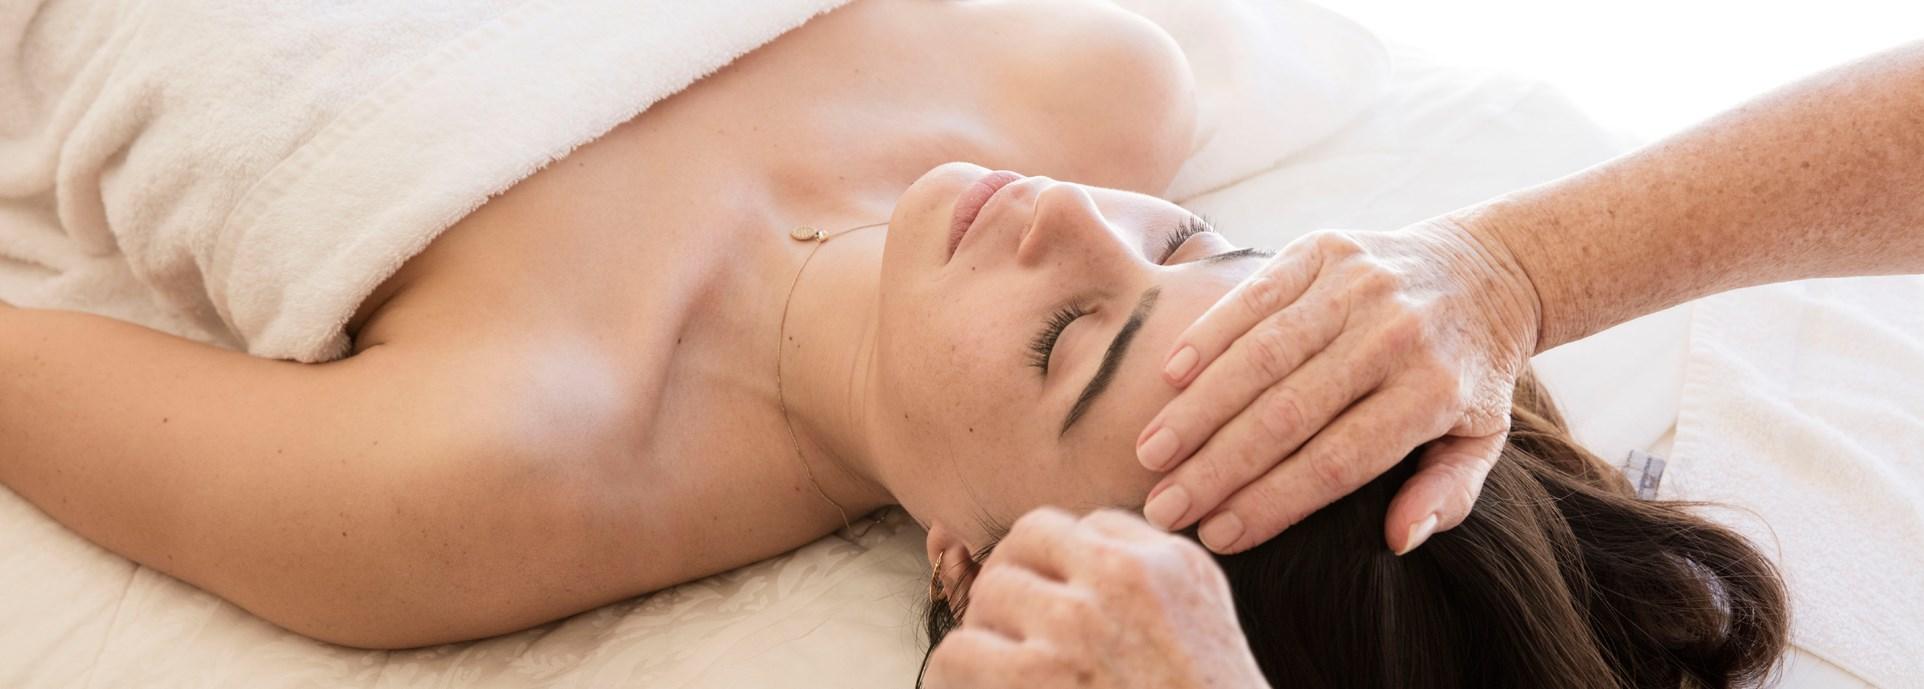 Pasoral Kfar Blum - spa treatments